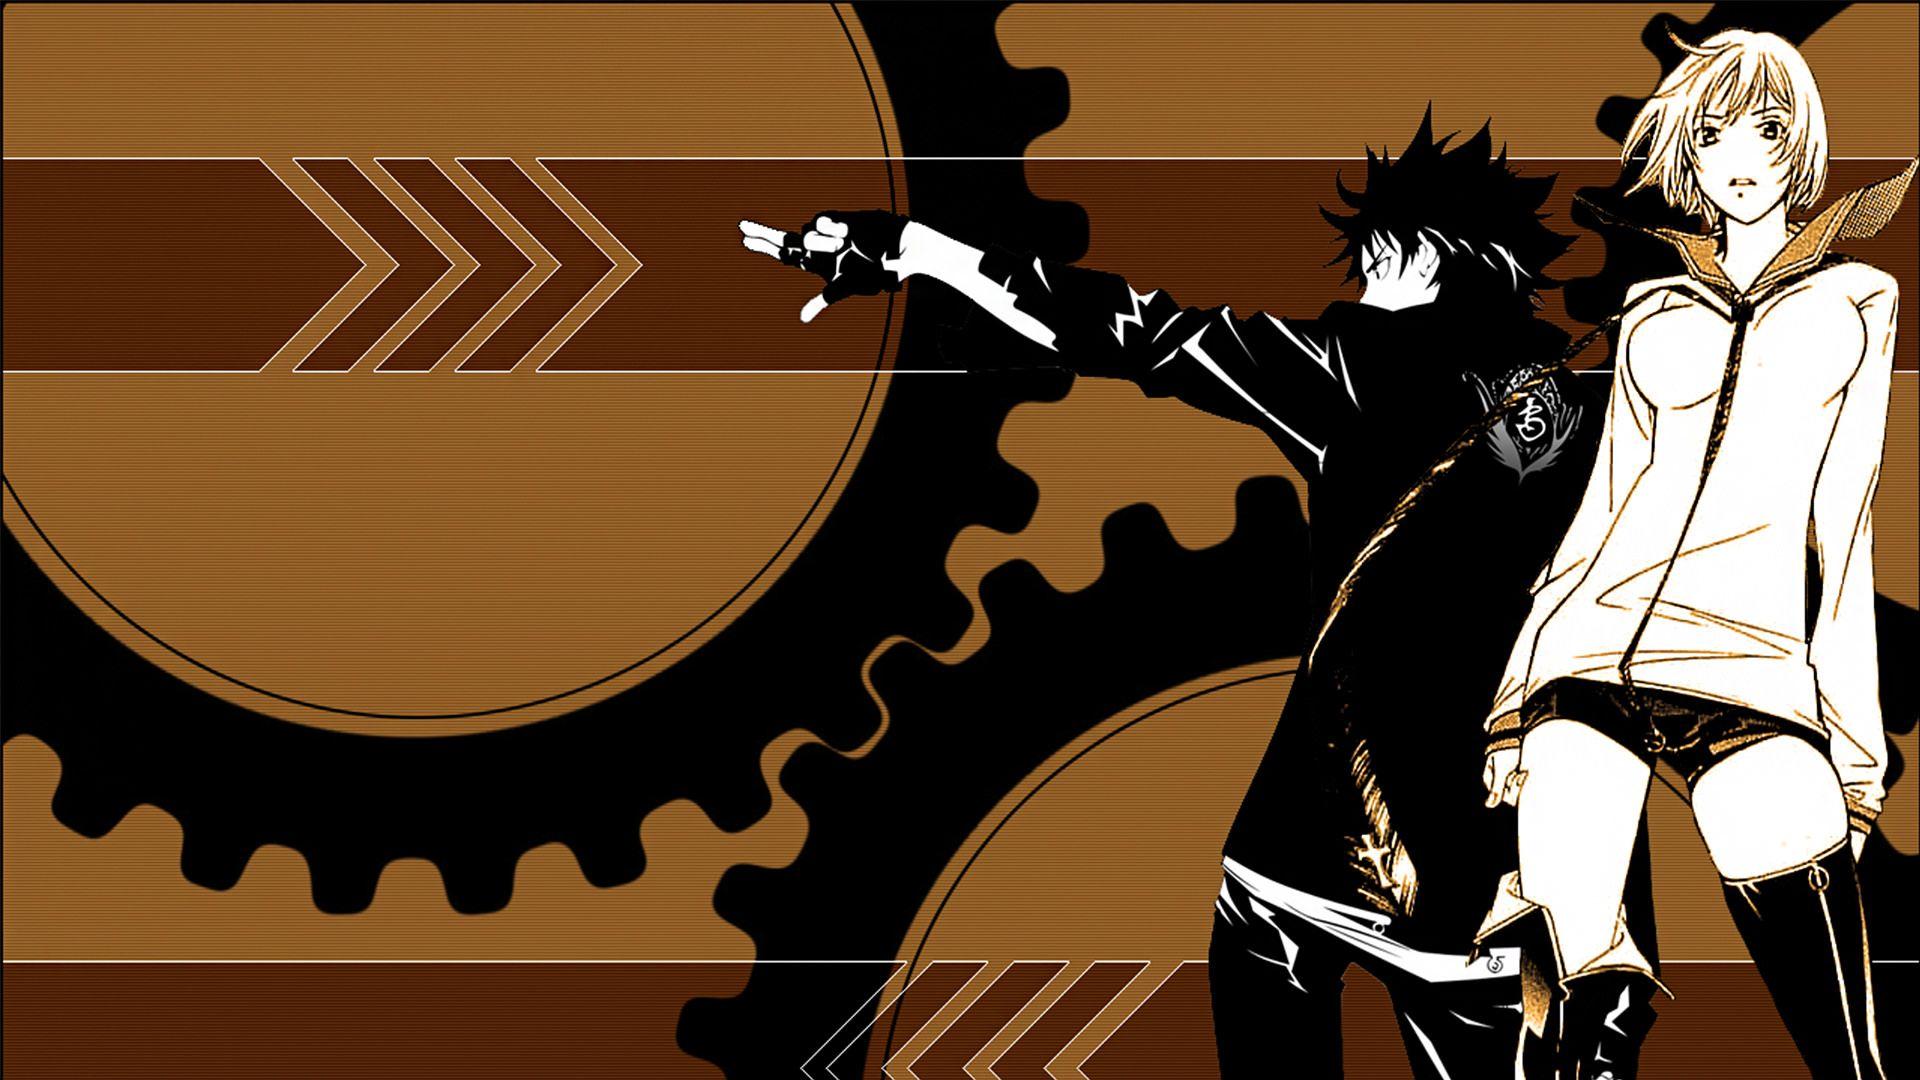 Big anime gaming hd 1920x1080u00a0 wallpaper dump 411